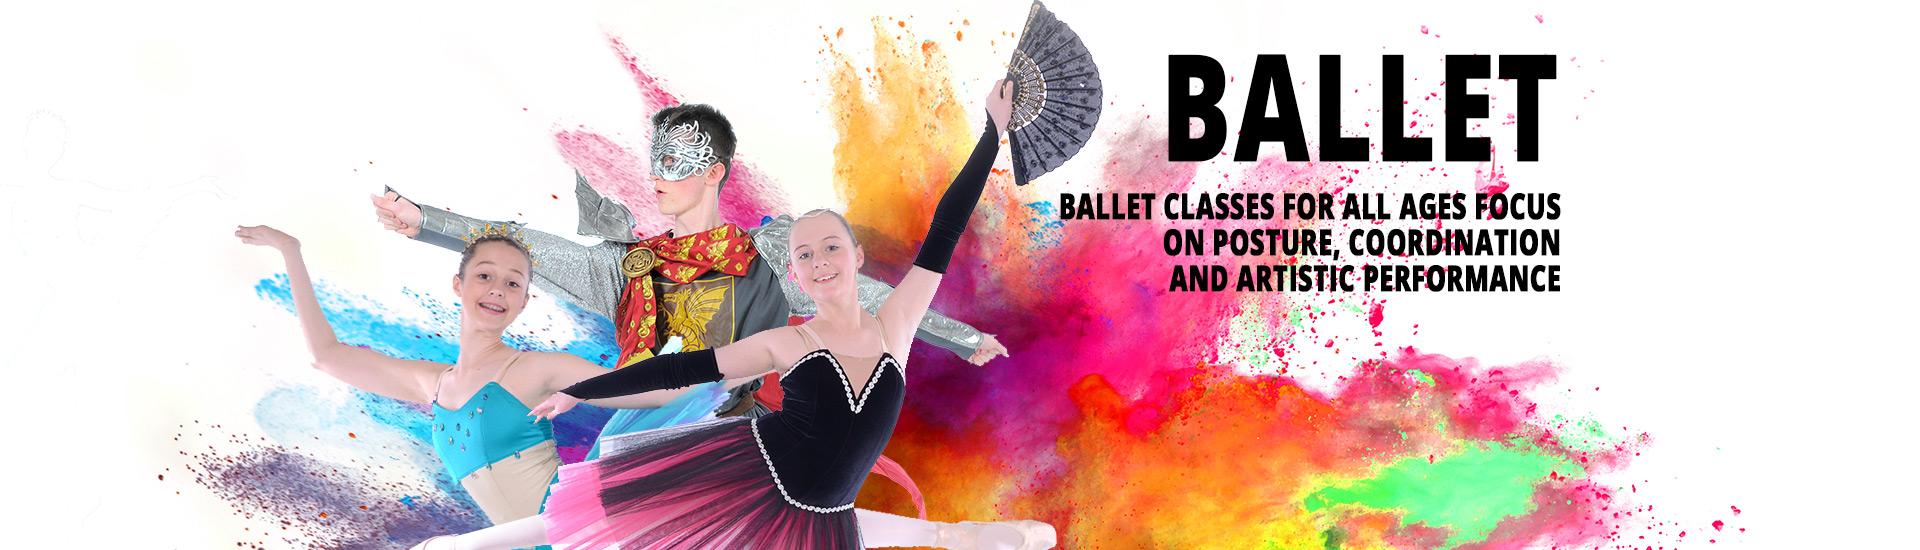 banner-ballet-1